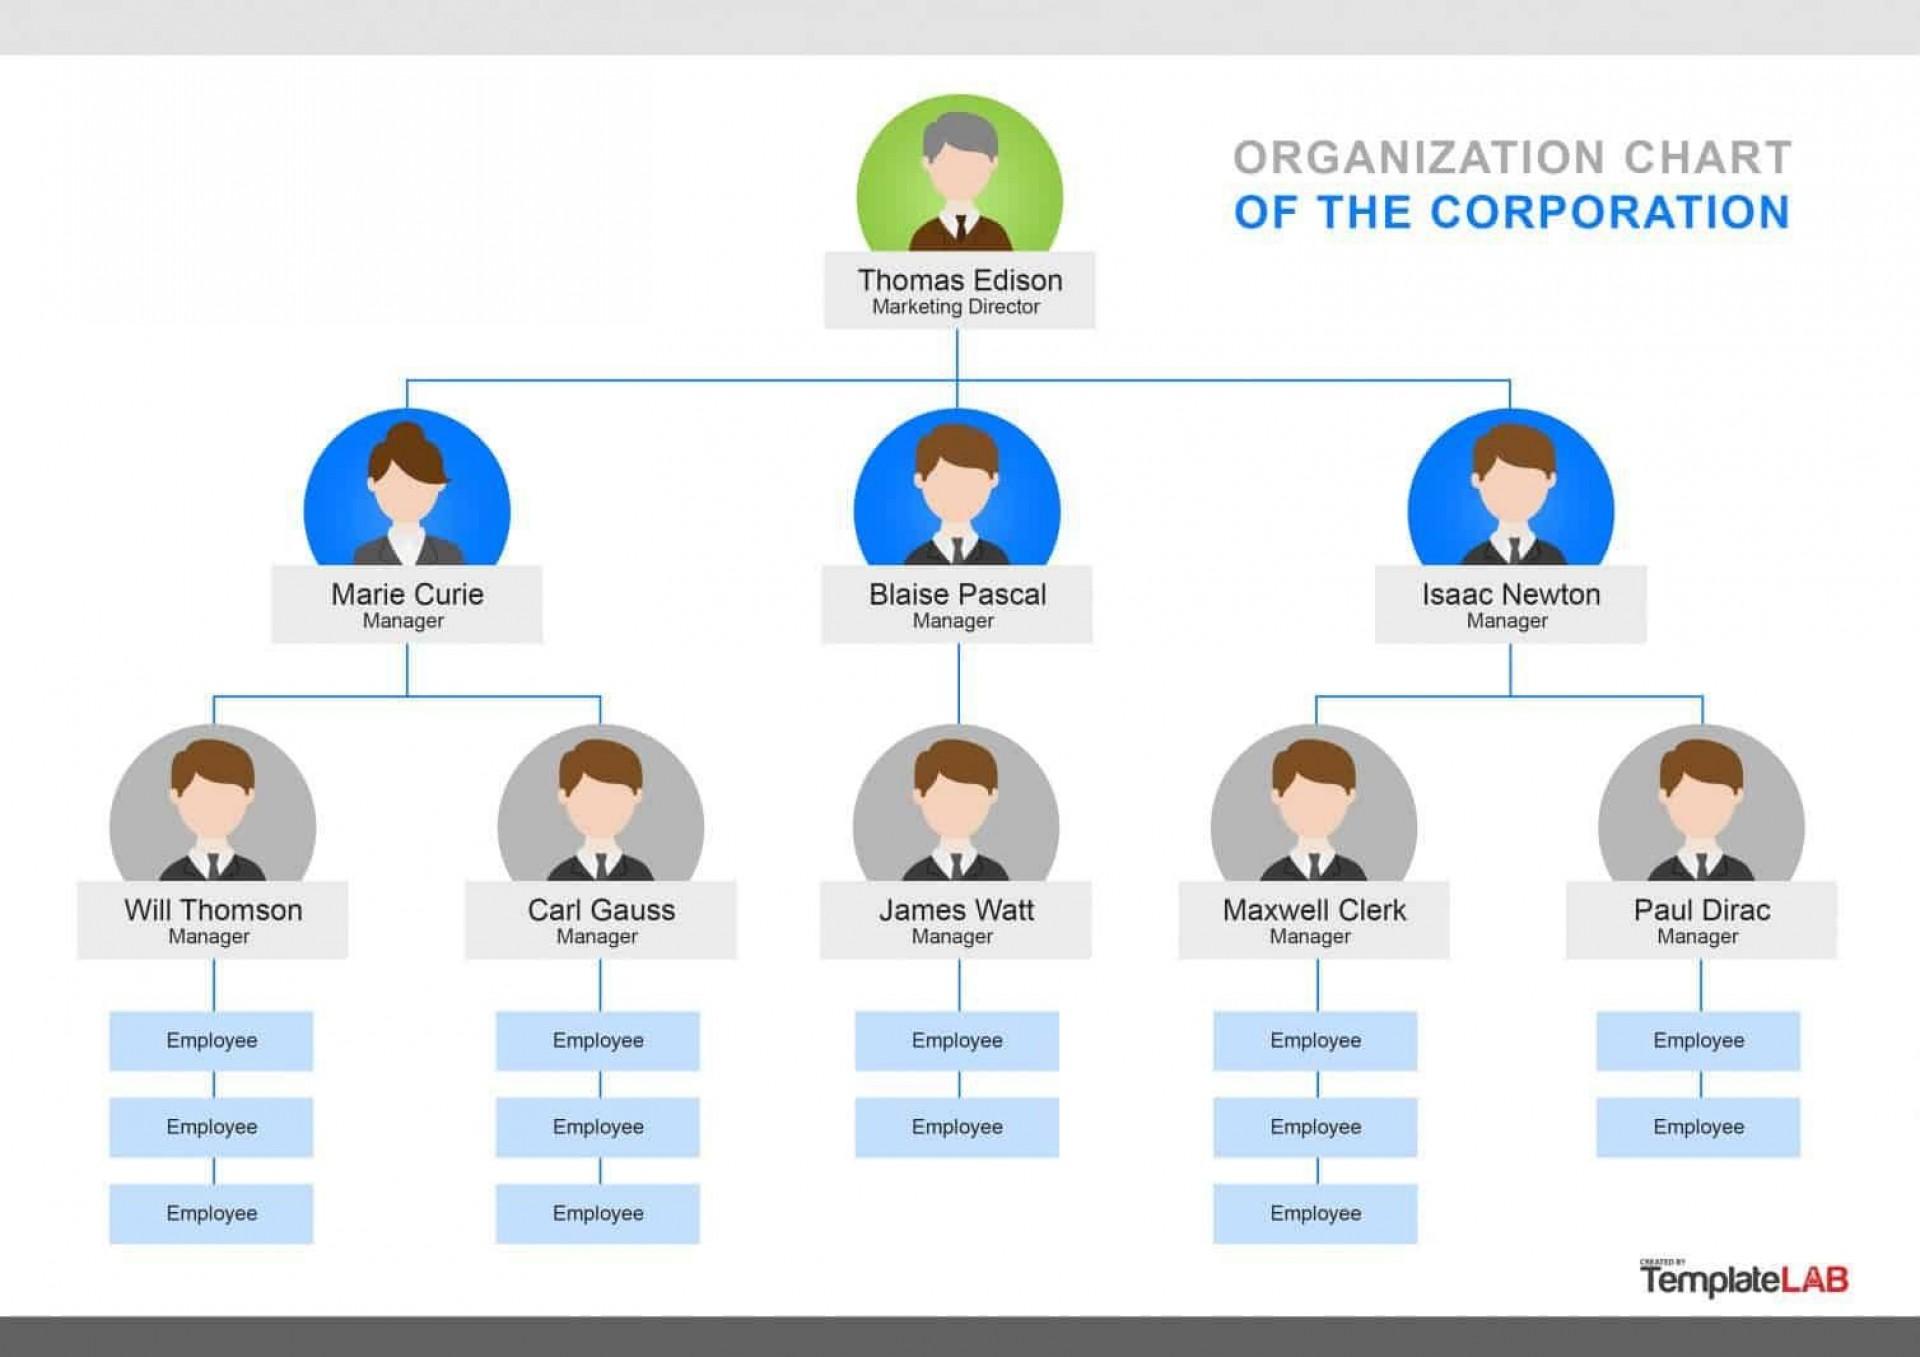 001 Fascinating Org Chart Template Powerpoint Photo  Free Organization Download Organizational 20101920